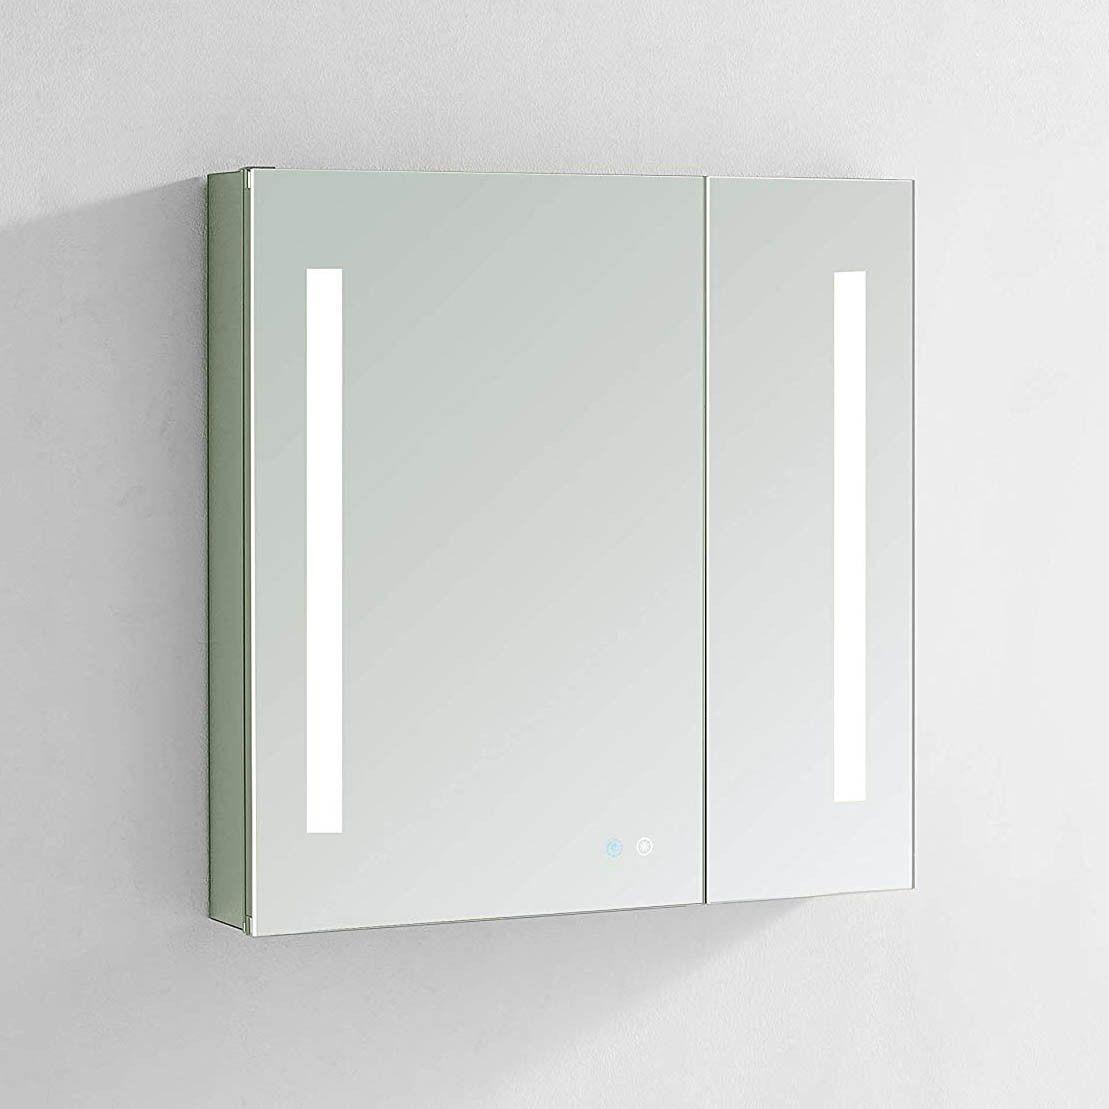 Aquadom Signature Royale 36 X 30 Inch Medicine Cabinet With Light In 2021 Medicine Cabinet With Lights Bathroom Mirror Cabinet Bathroom Style